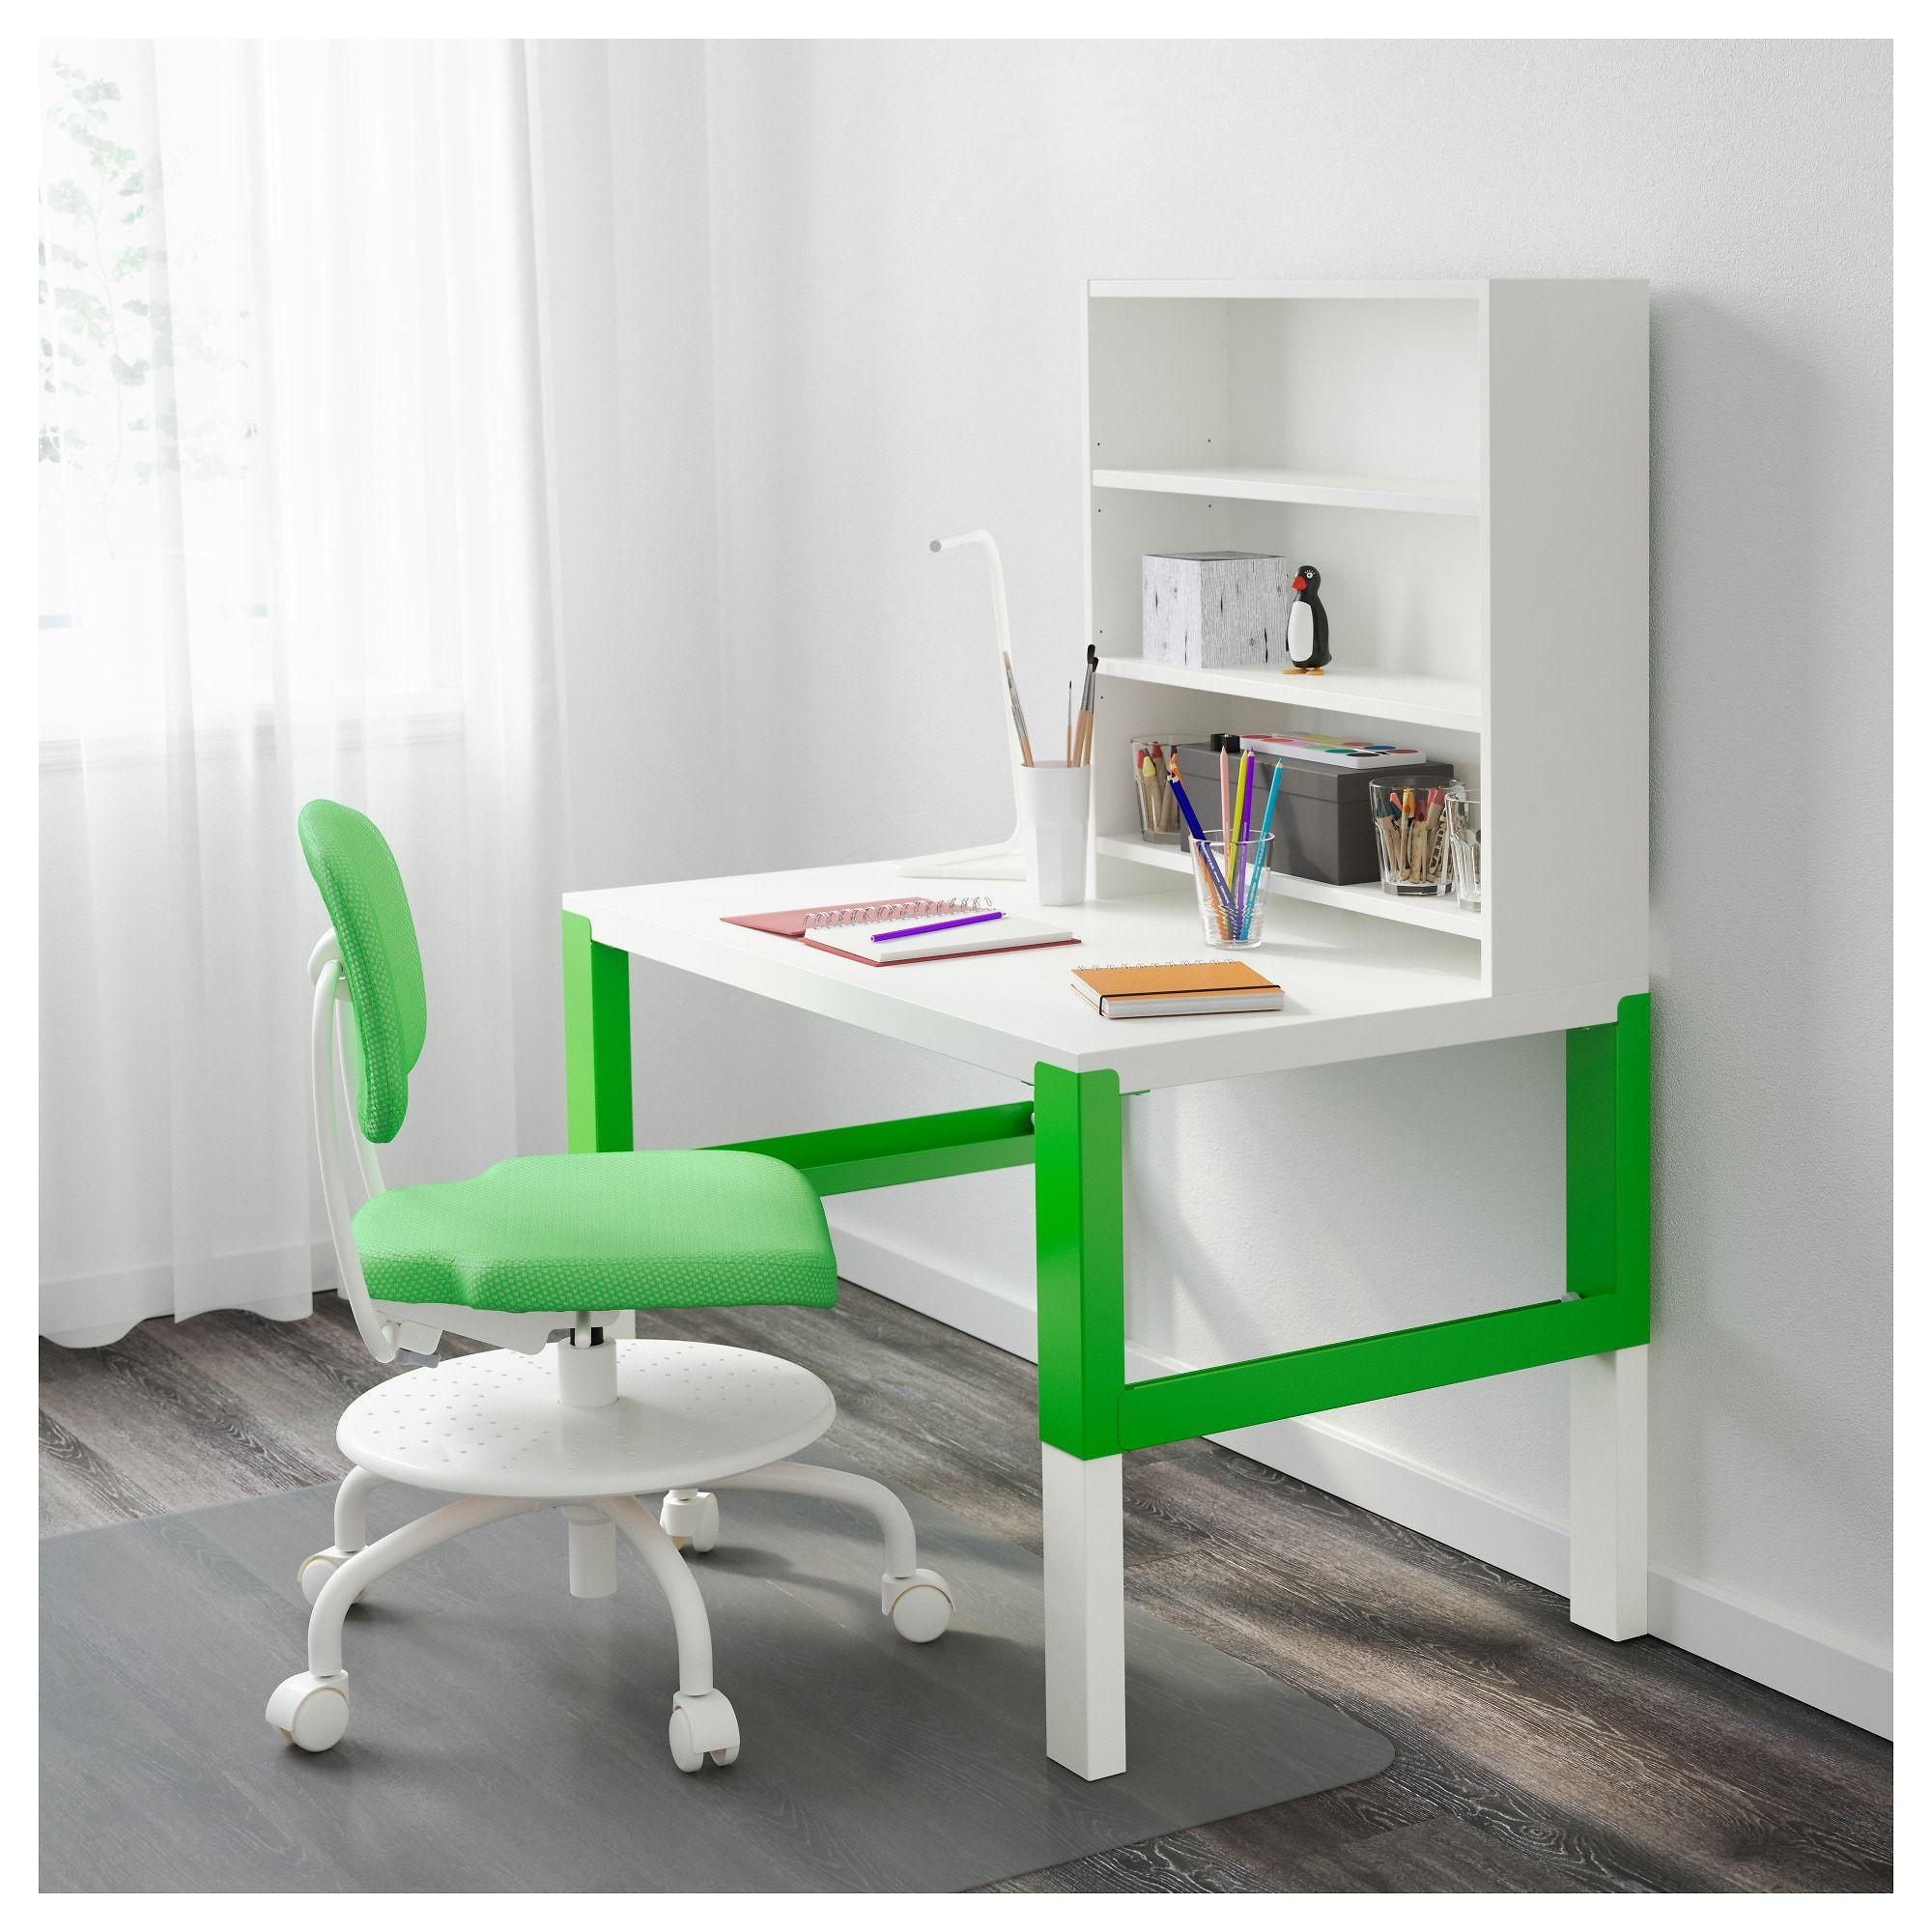 Ikea Pahl White Green Desk With Add On Unit Desk Ikea White Desks